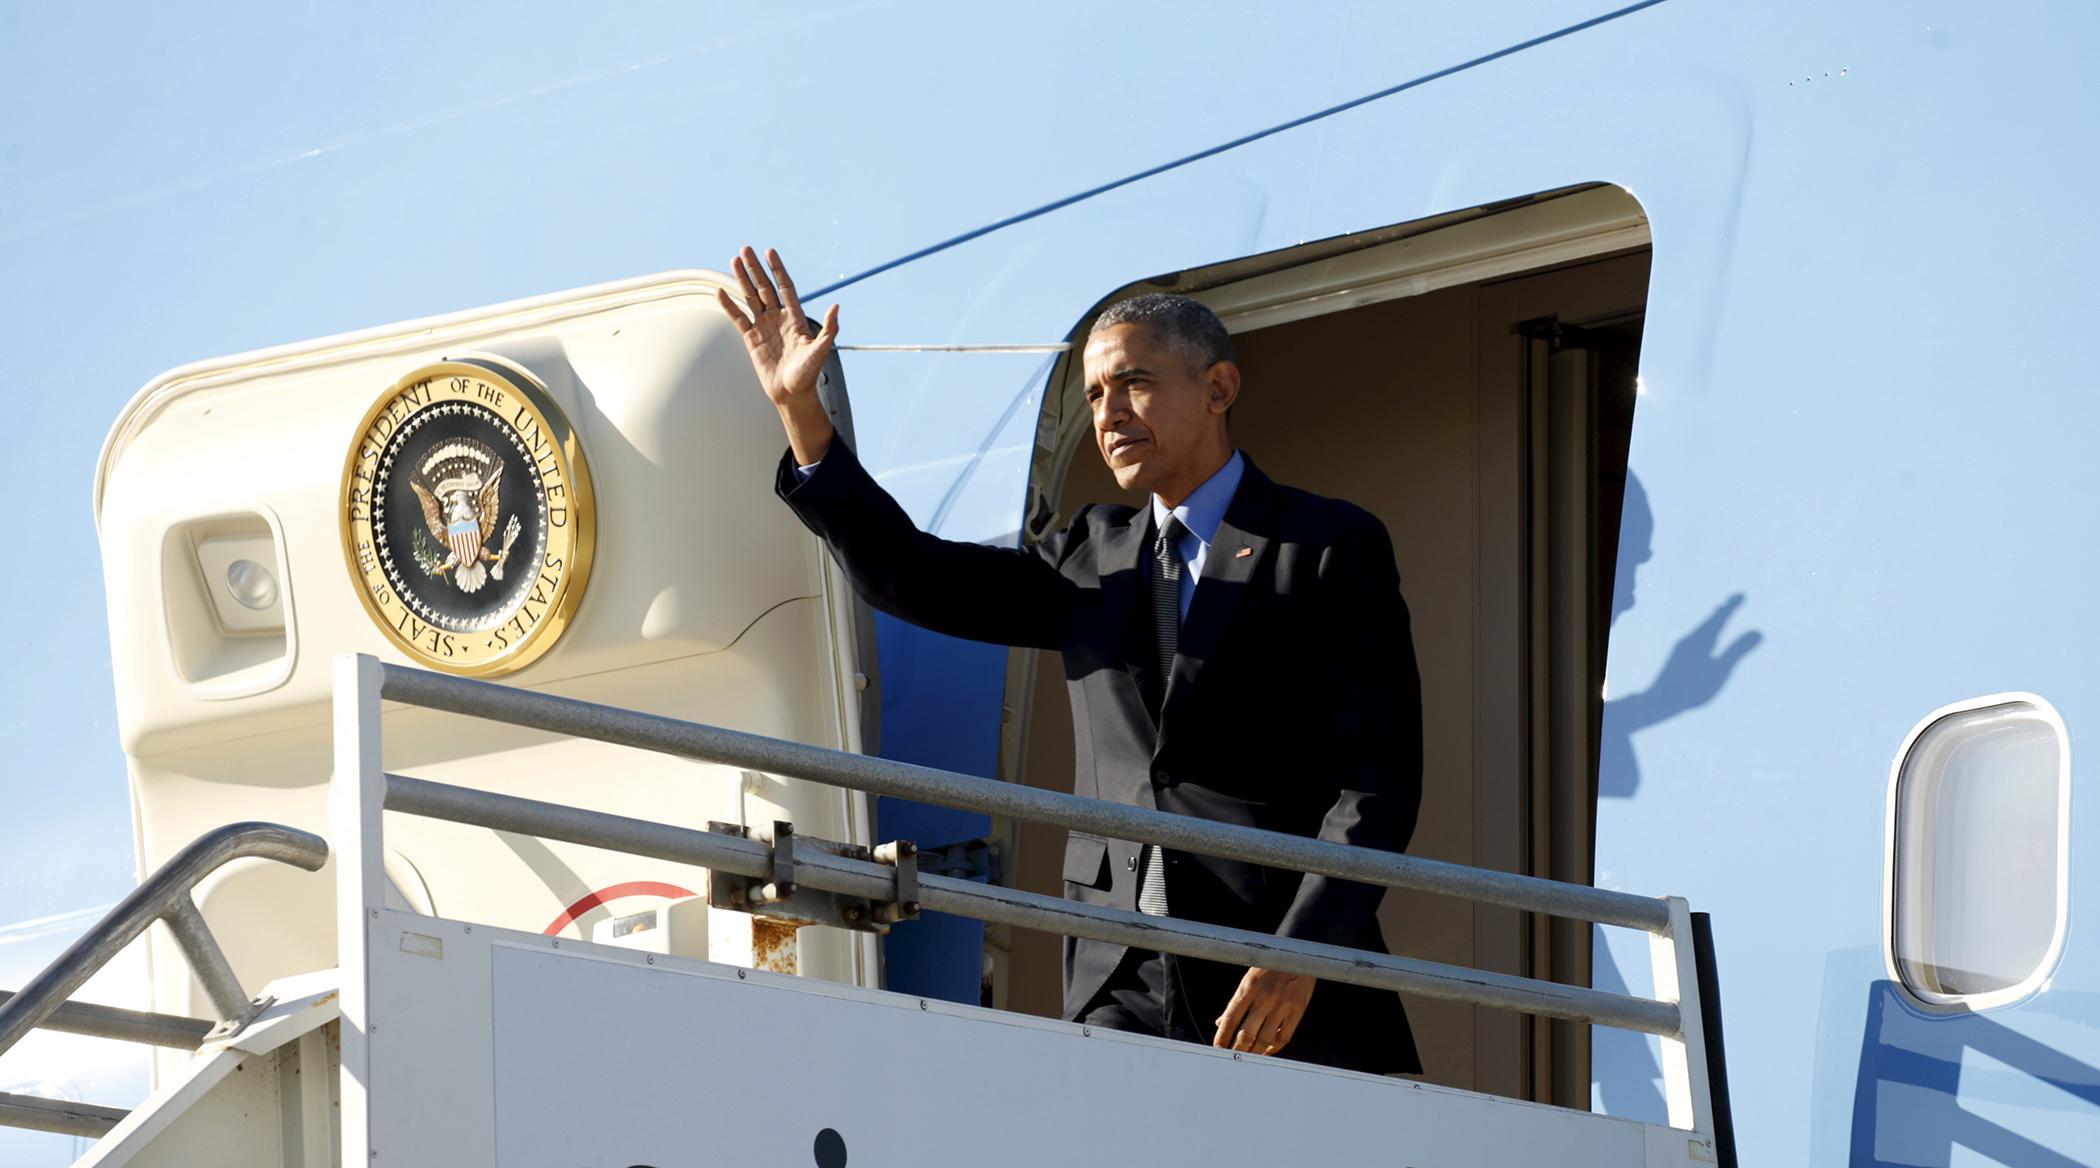 U.S. President Barack Obama arrives in Los Angeles, California February 11, 2016.